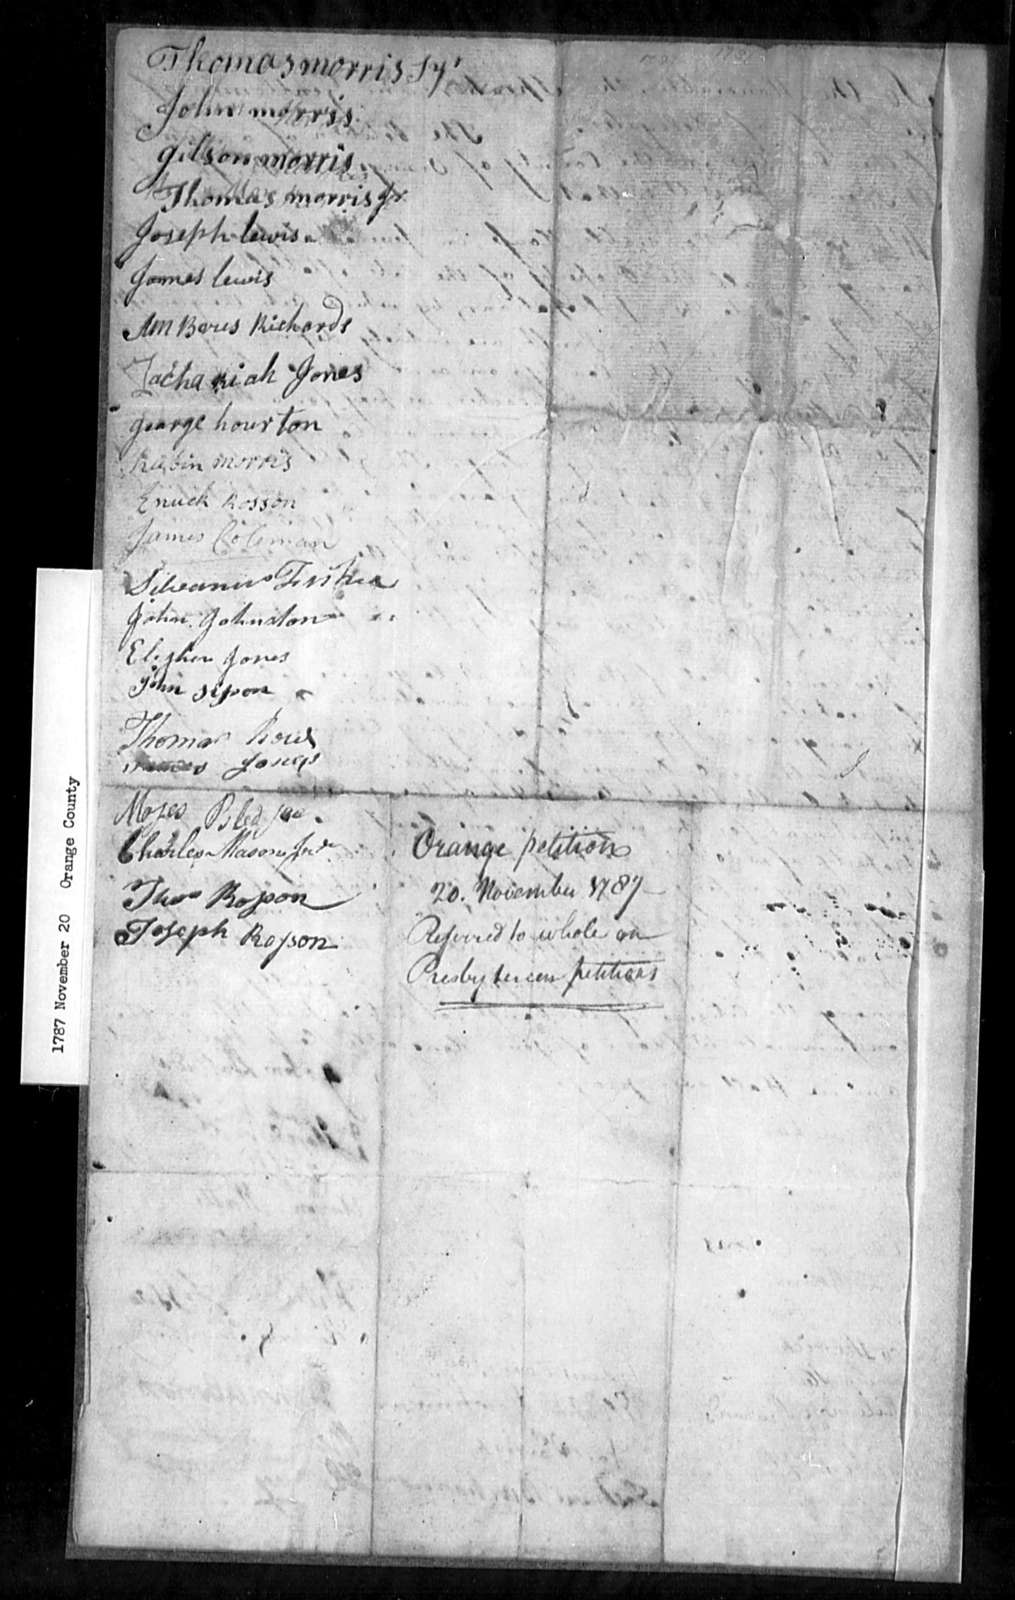 November 20, 1787, Orange, St. Thomas' Parish, for sale of glebes.